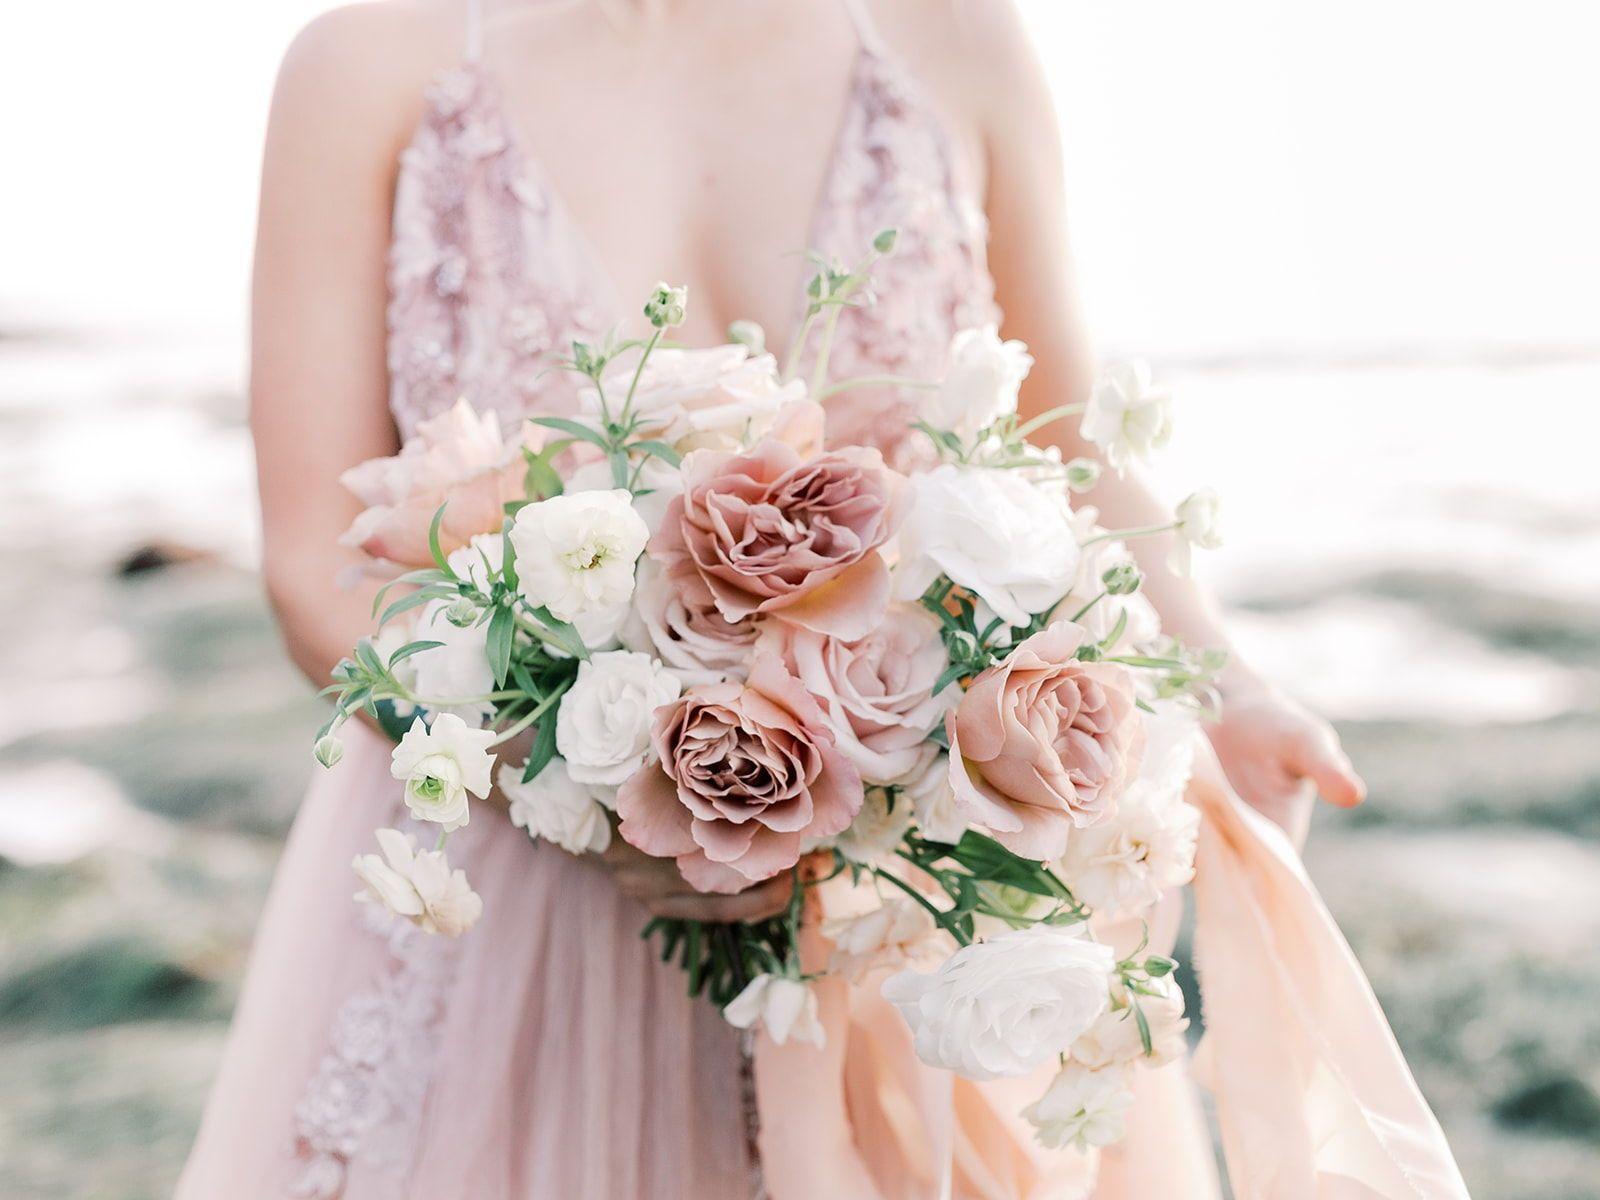 Romantic Organic Garden Style Bridal Bouquet In 2020 Wedding Dress Champagne Blush Wedding Flowers Wedding Highlights